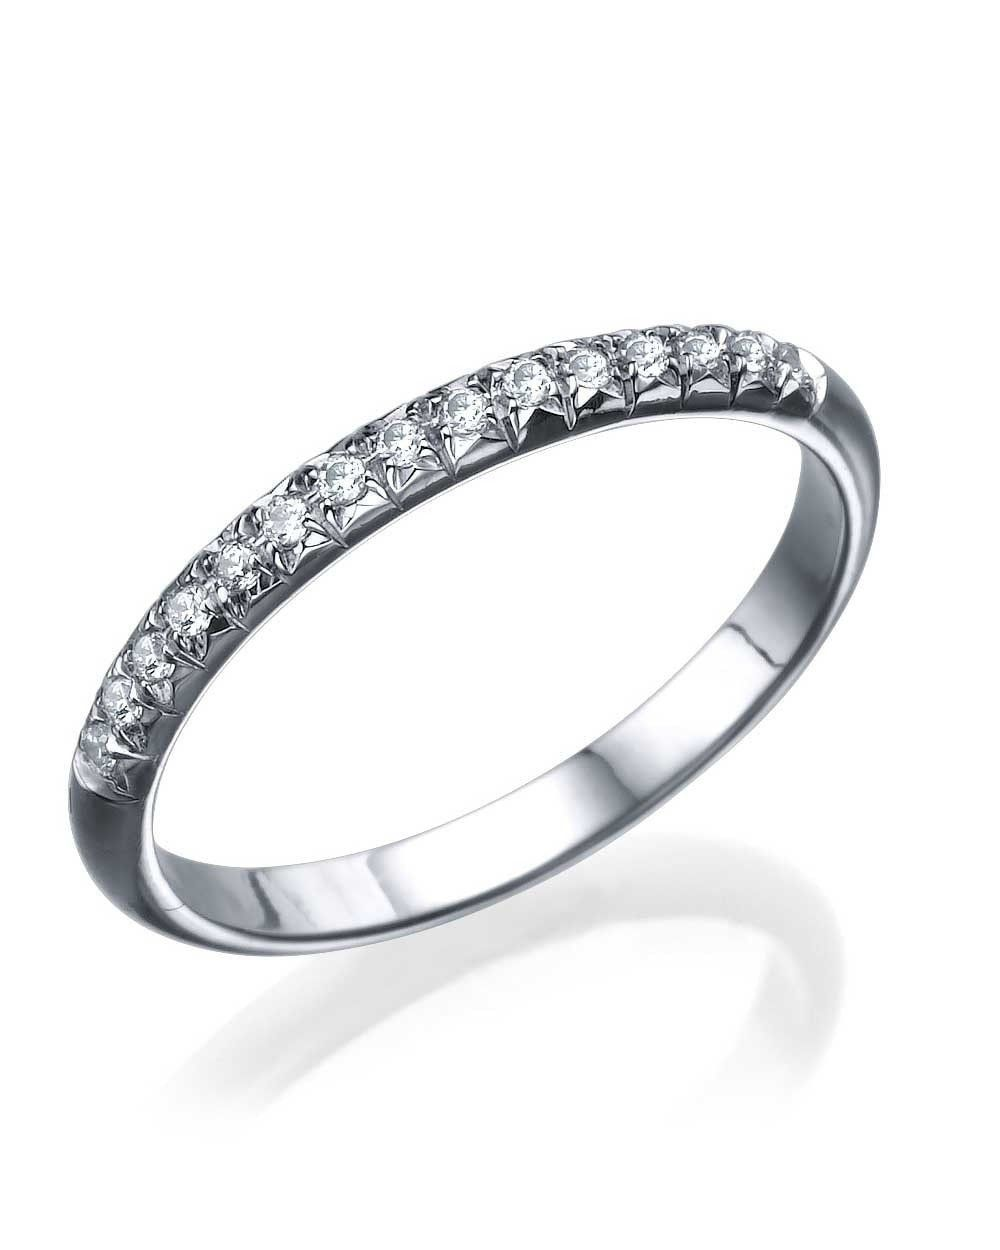 Platinum Wedding Bands For Women 0 15ct Diamond Semi Eternity Ring Platinum Wedding Band Wedding Ring Bands Set Wedding Ring Bands